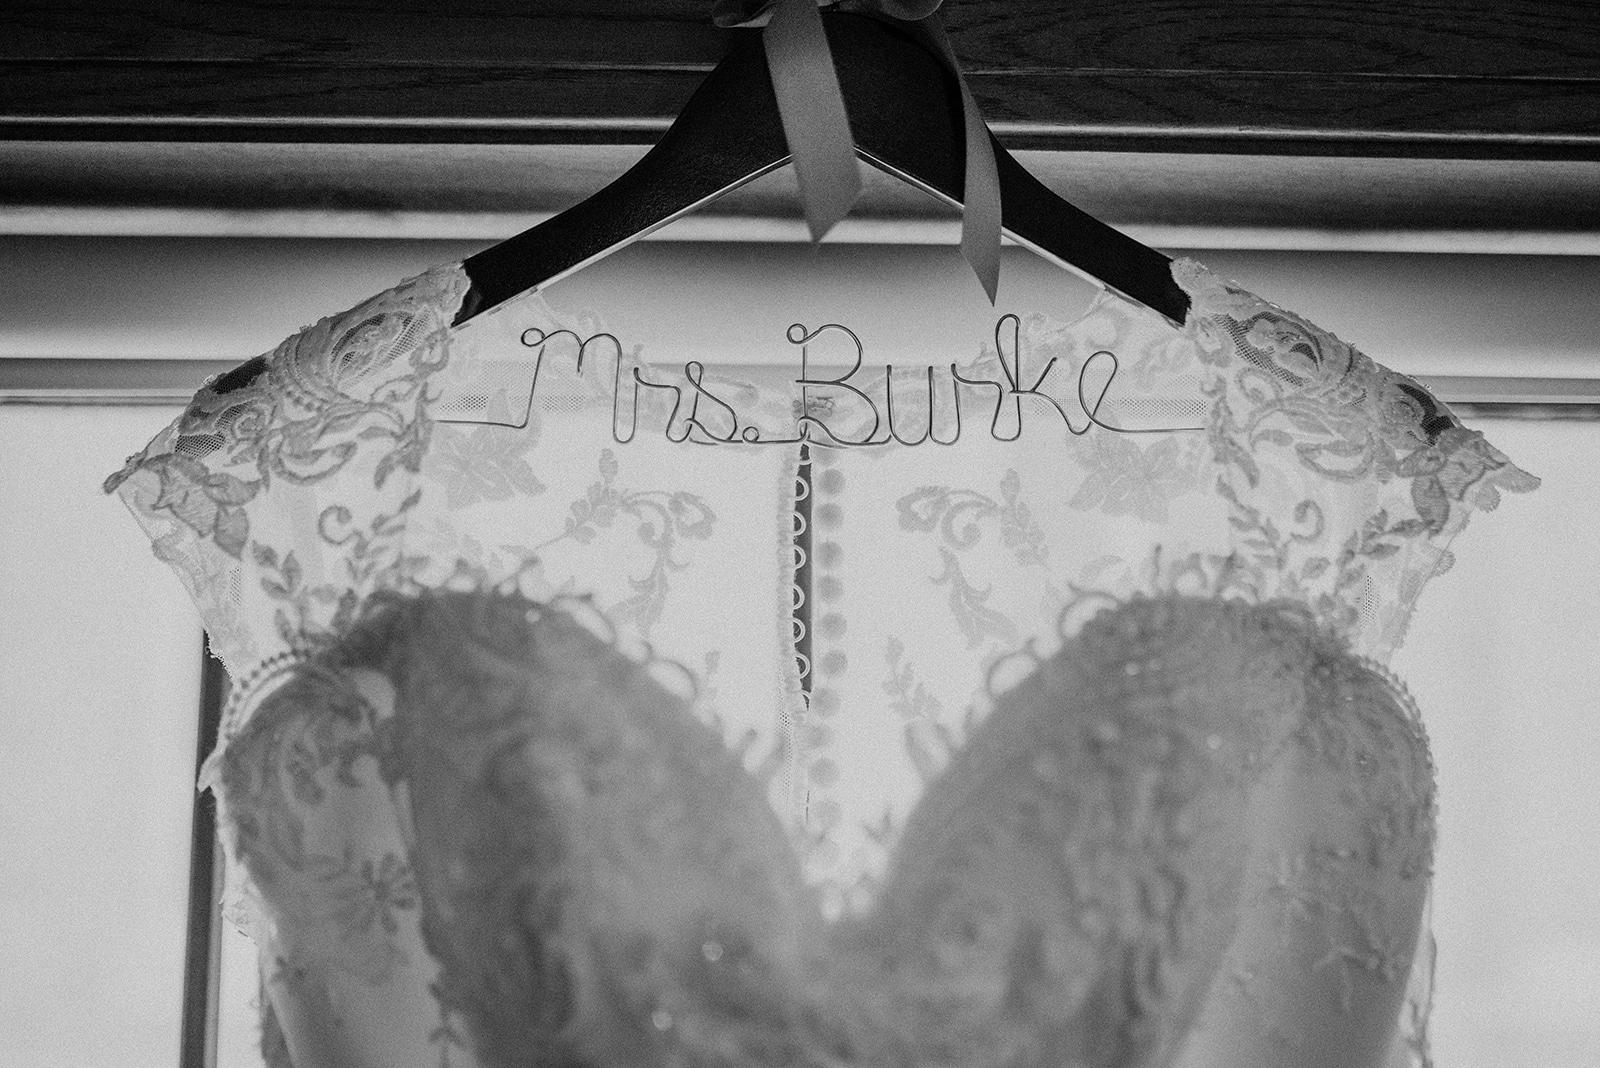 Burke_0065.jpg